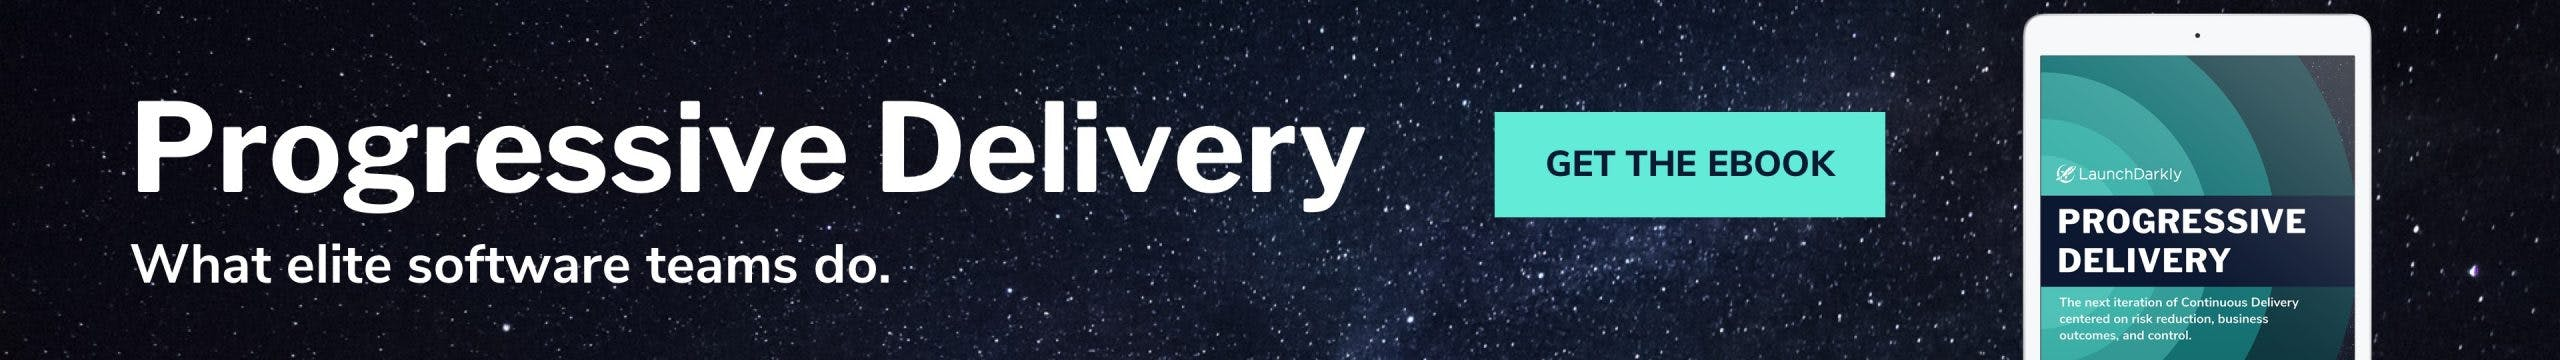 Progressive-Delivery-ebook-blog-post-ad-1